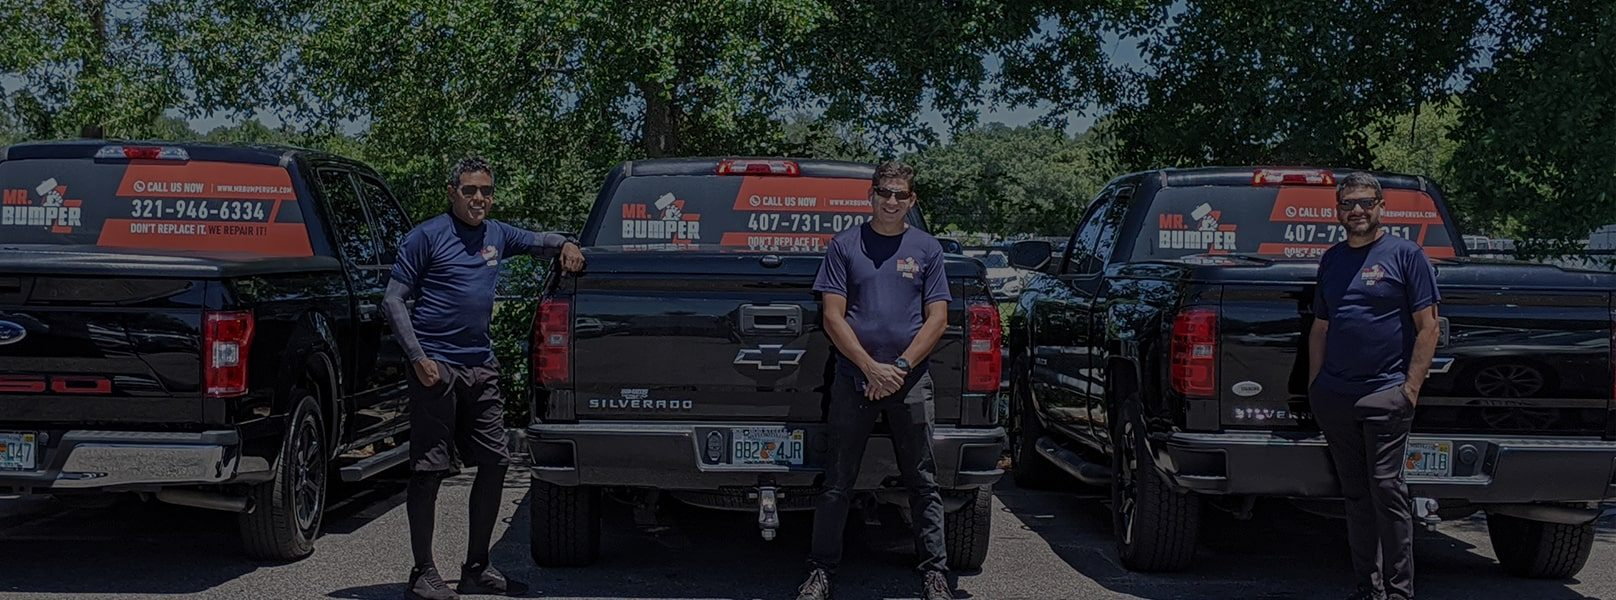 Mobile Bumper Repair Services